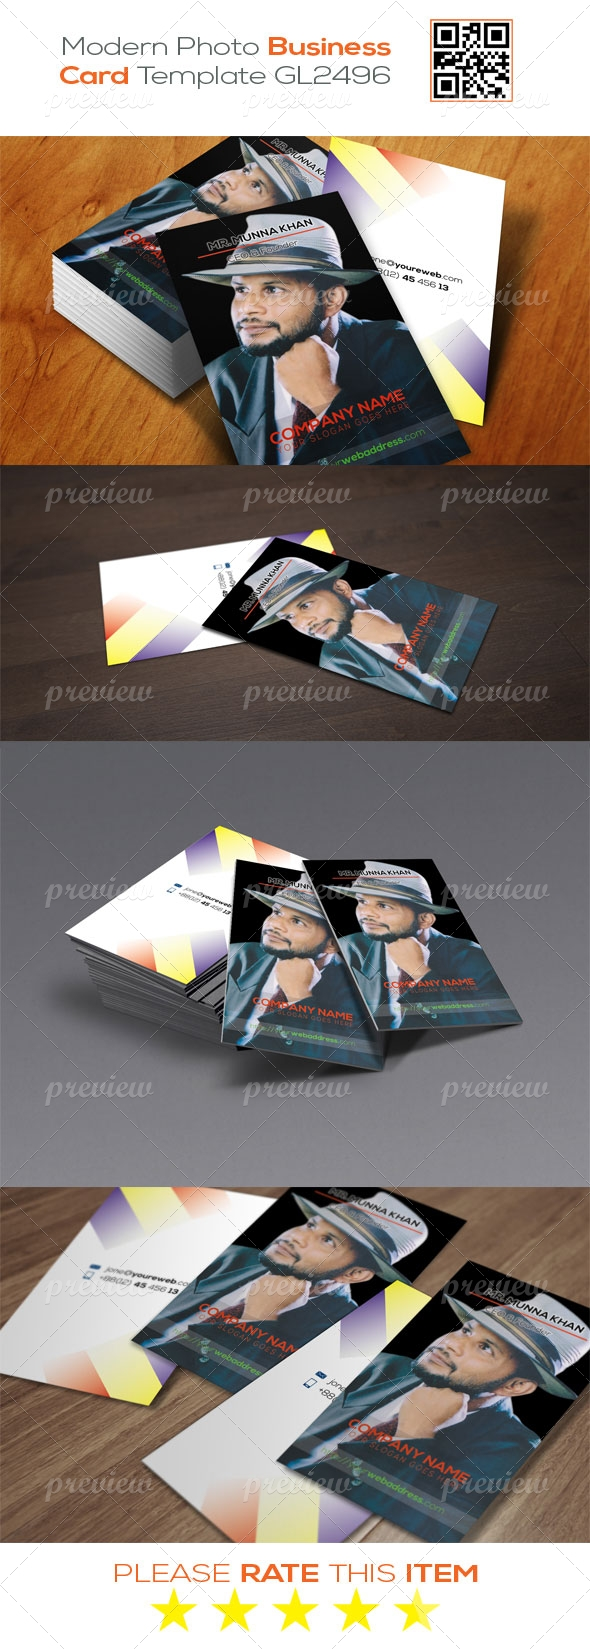 Modern Photo Business Card Template GL2496